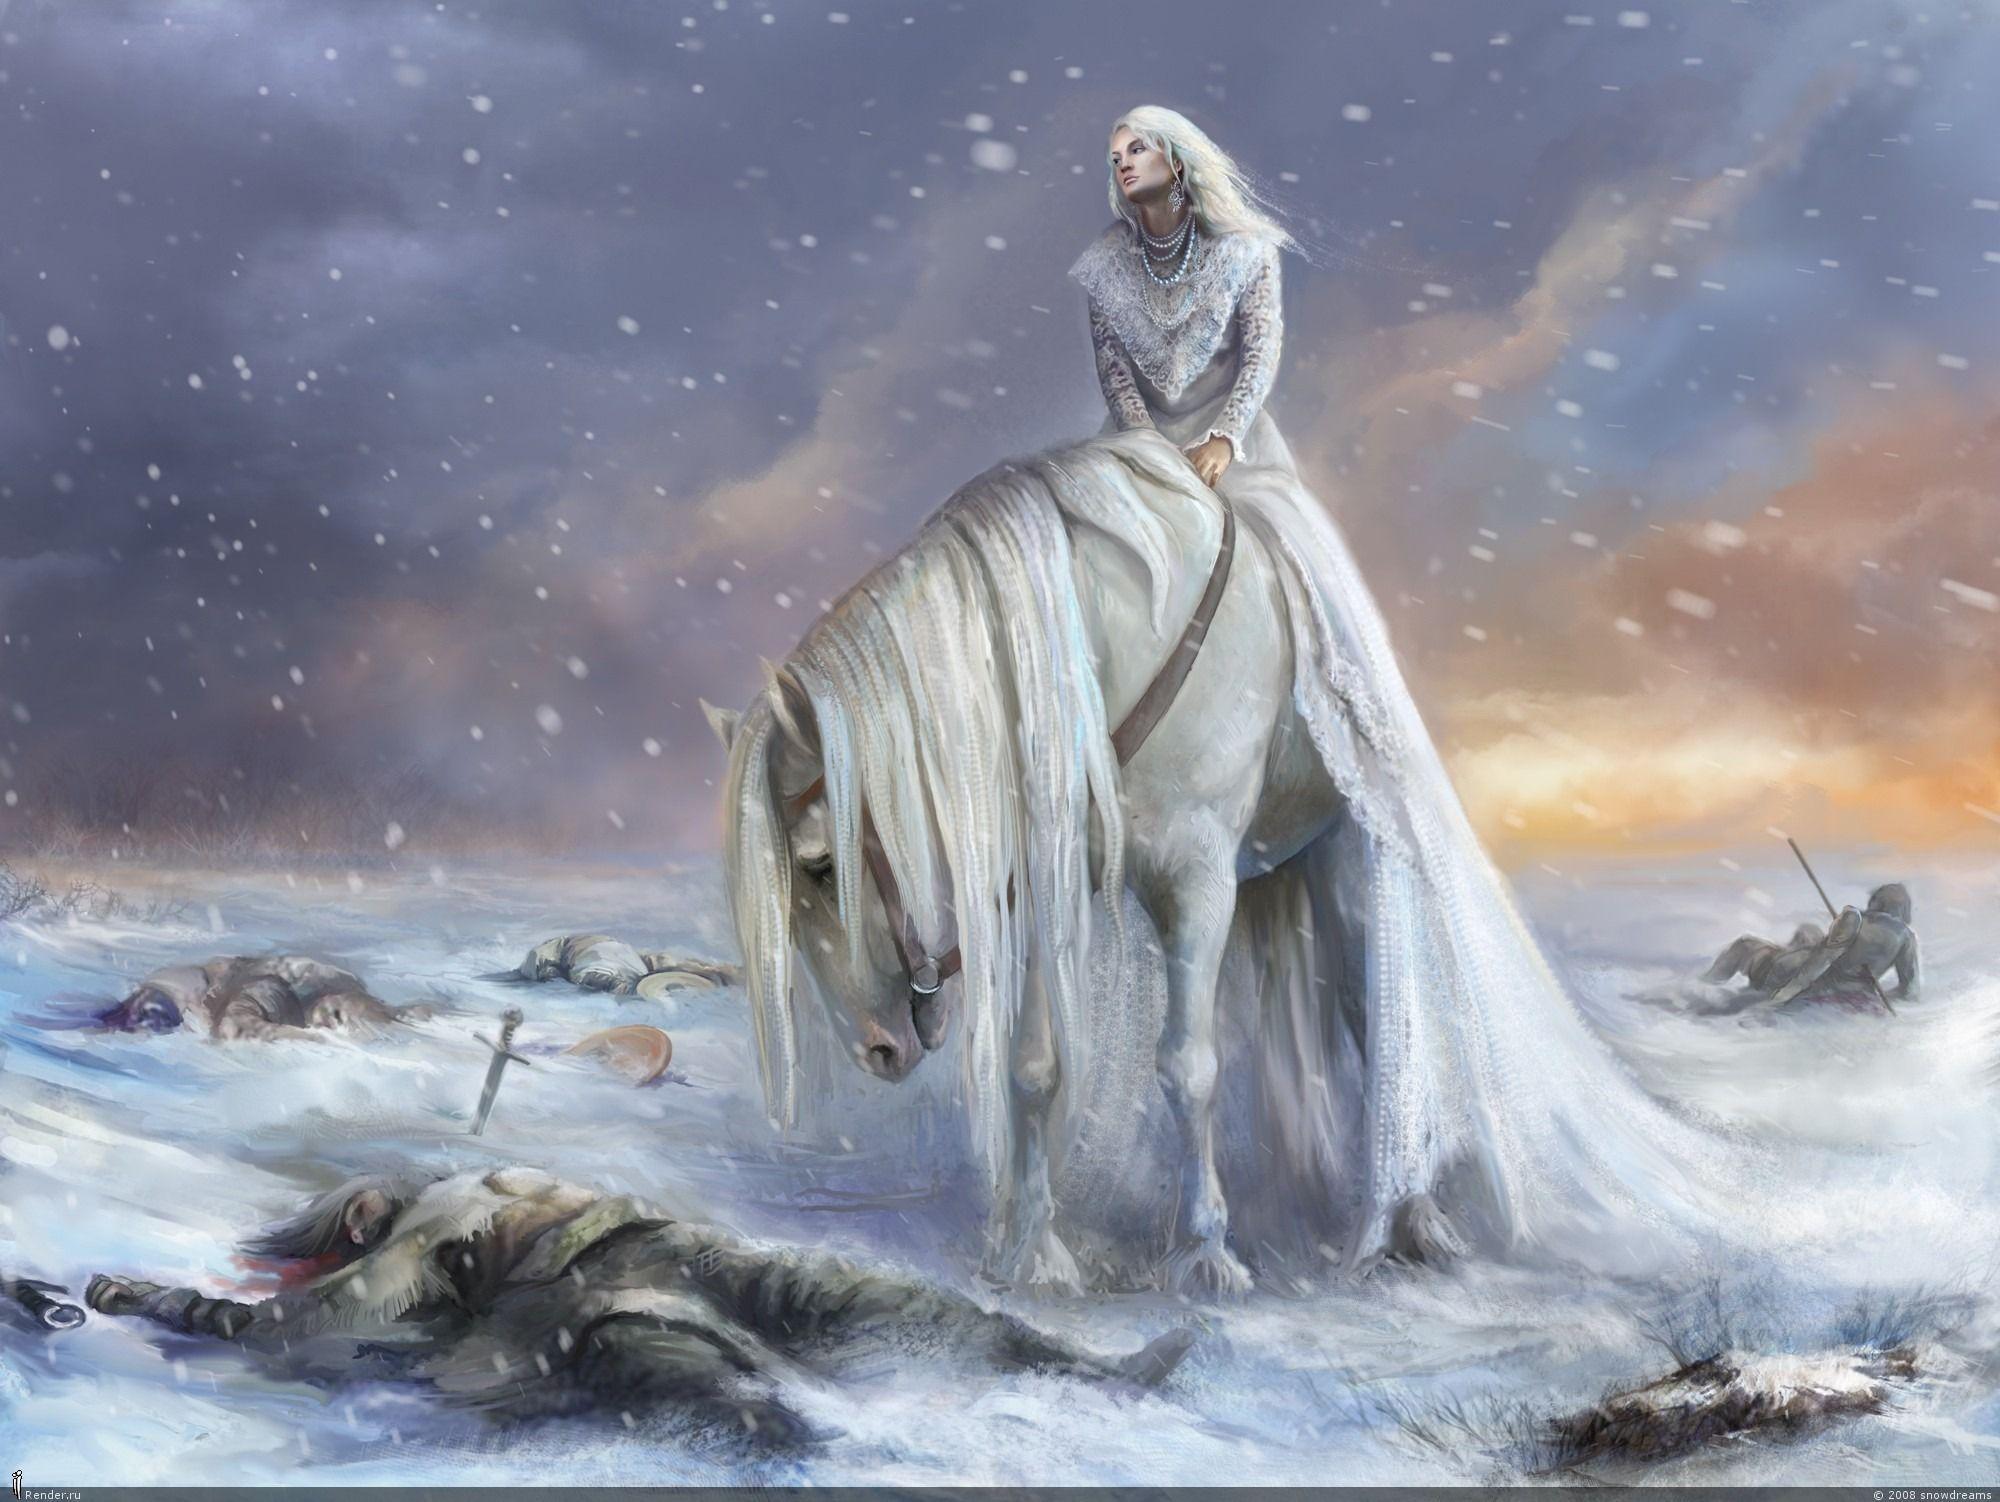 Top Wallpaper Horse Warrior - 288a2c4cb5b765c8522558b0644f6760  Image_108171.jpg